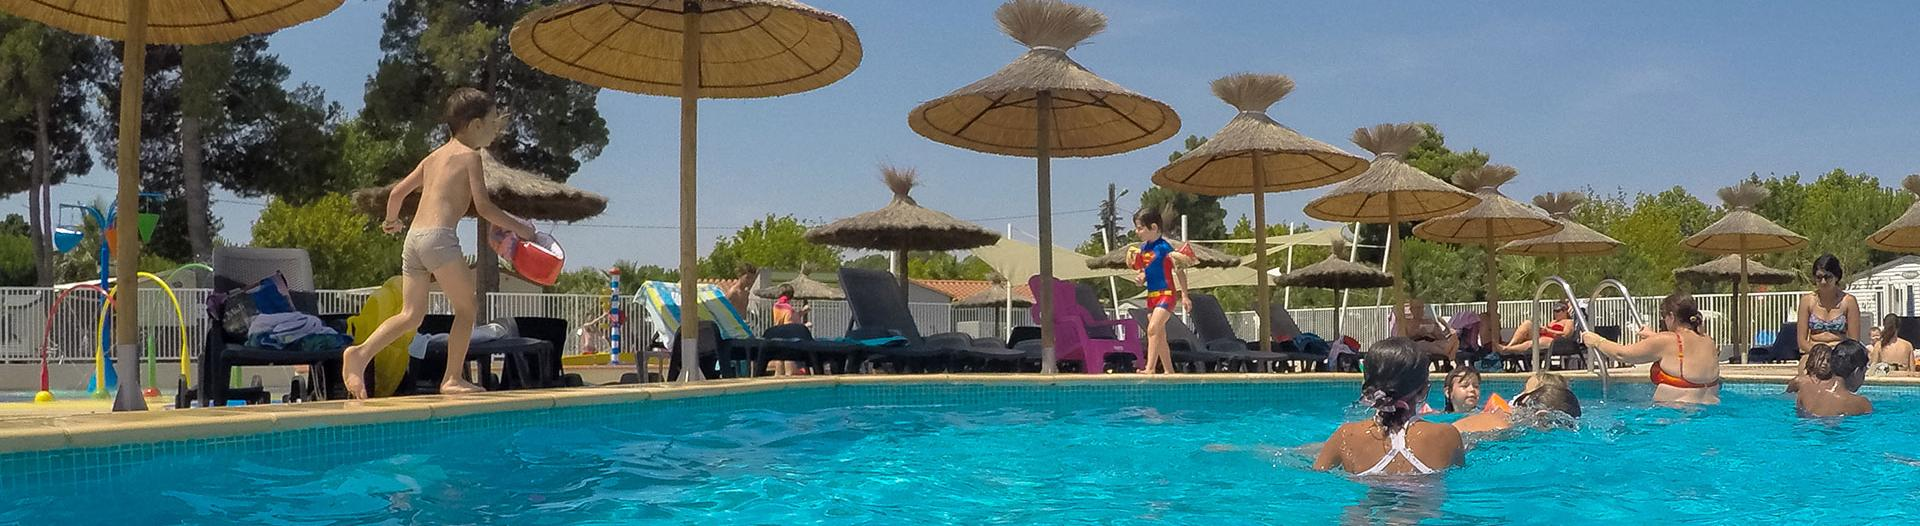 slider-camping-le-bosc-piscine